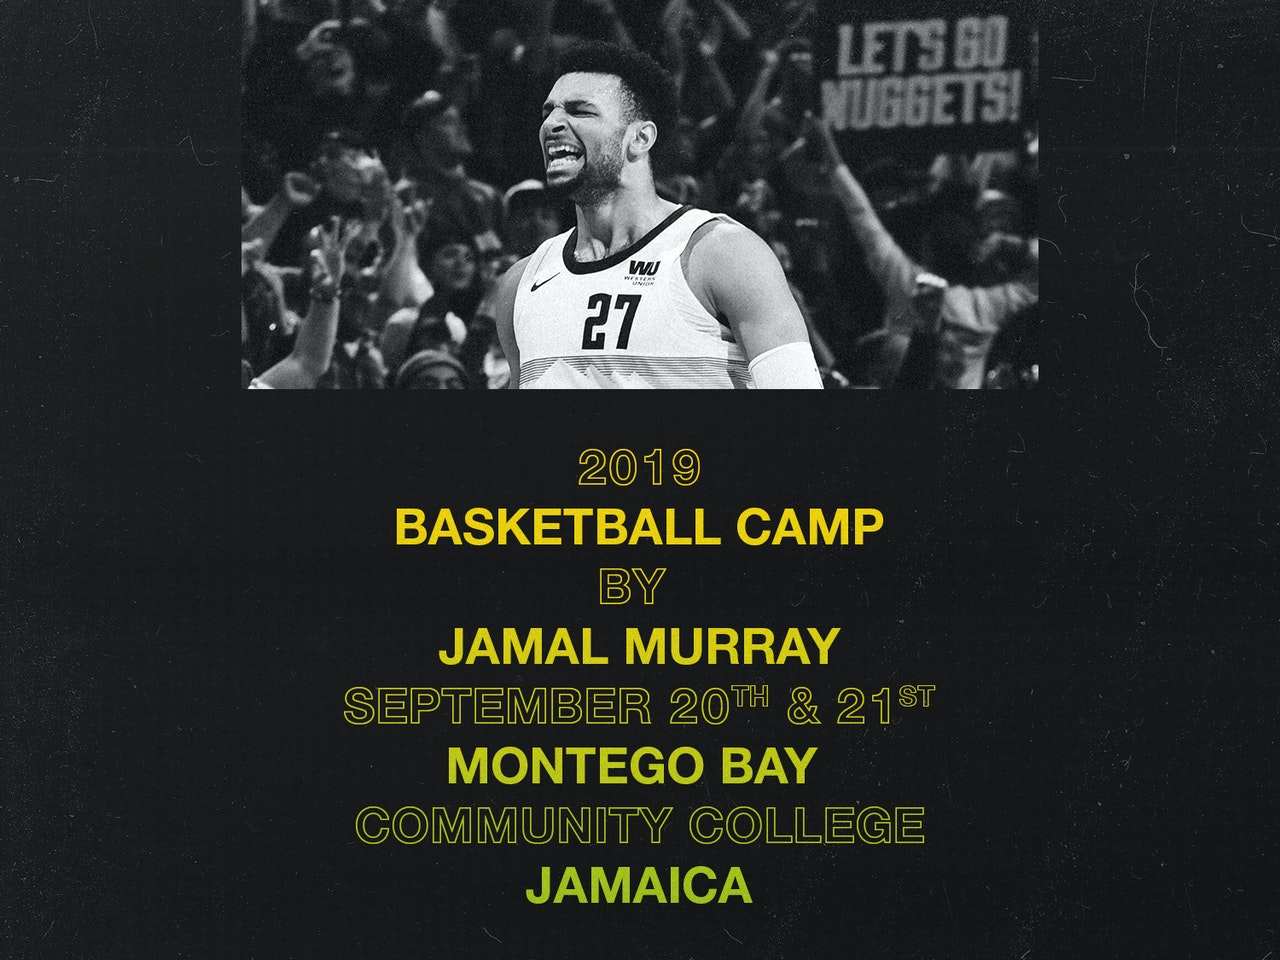 Jamal Murray - Jamaica TIMELINE